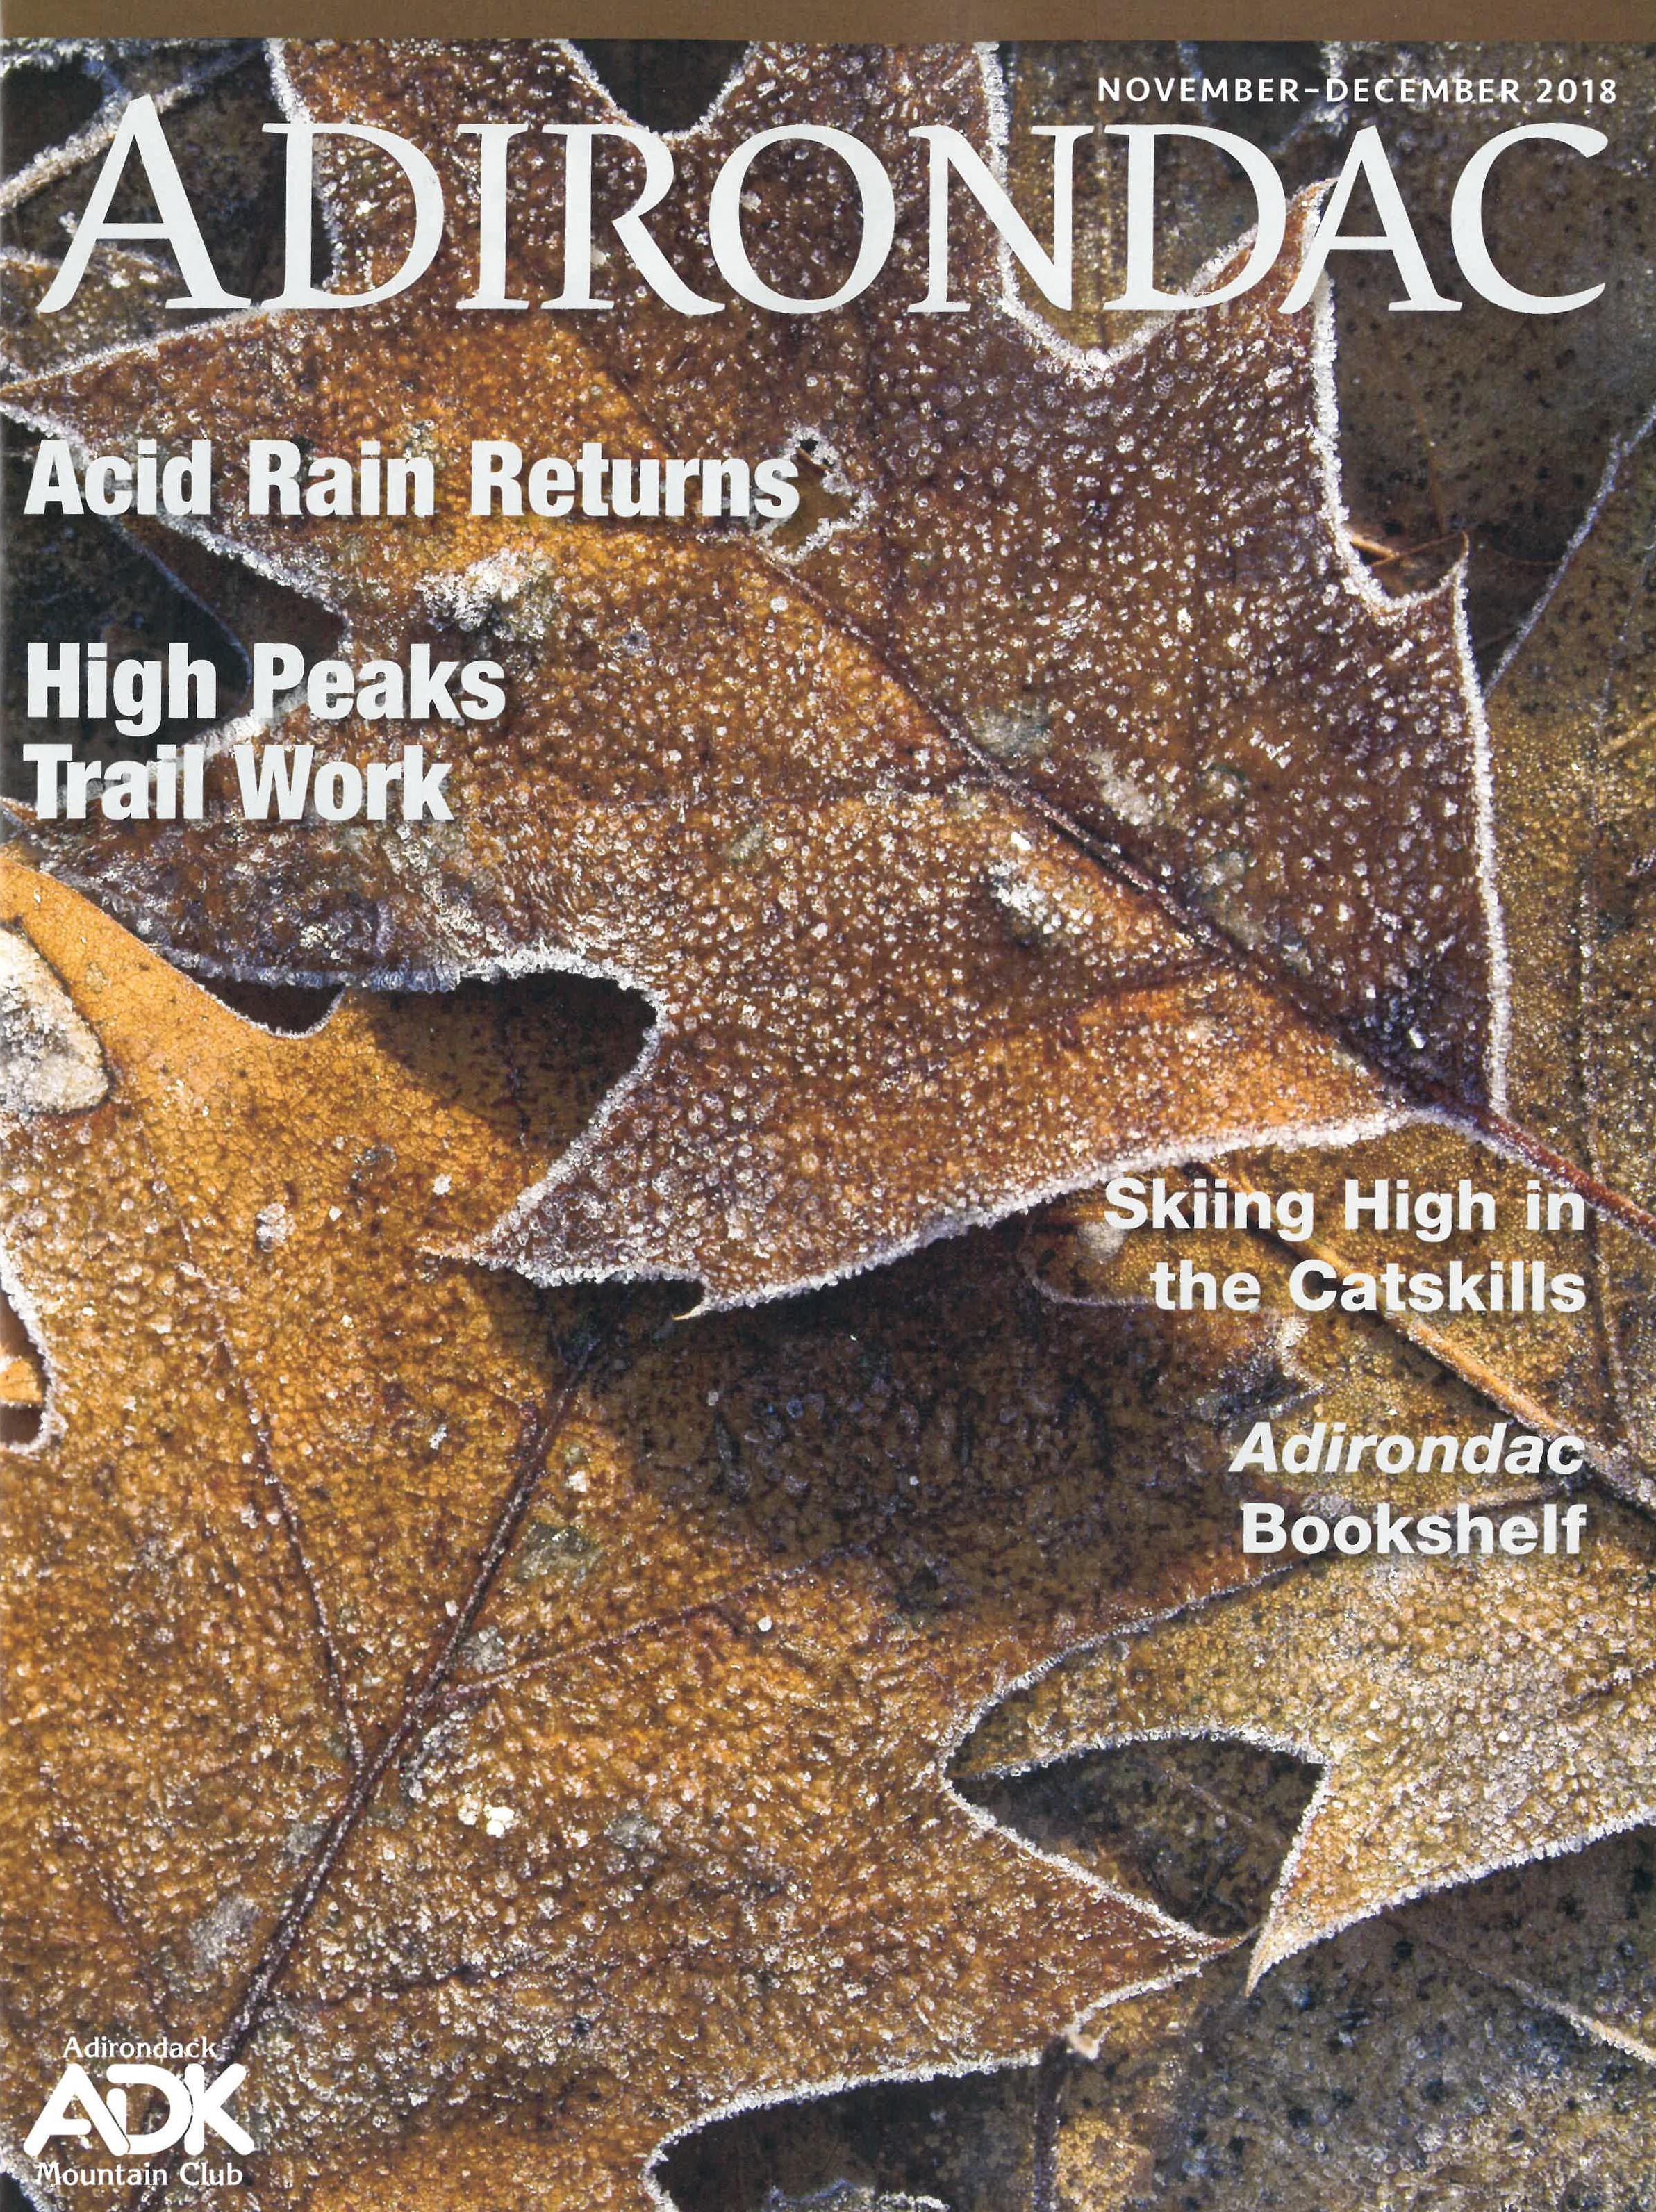 Adirondac Magazine Adirondack Mountain Club